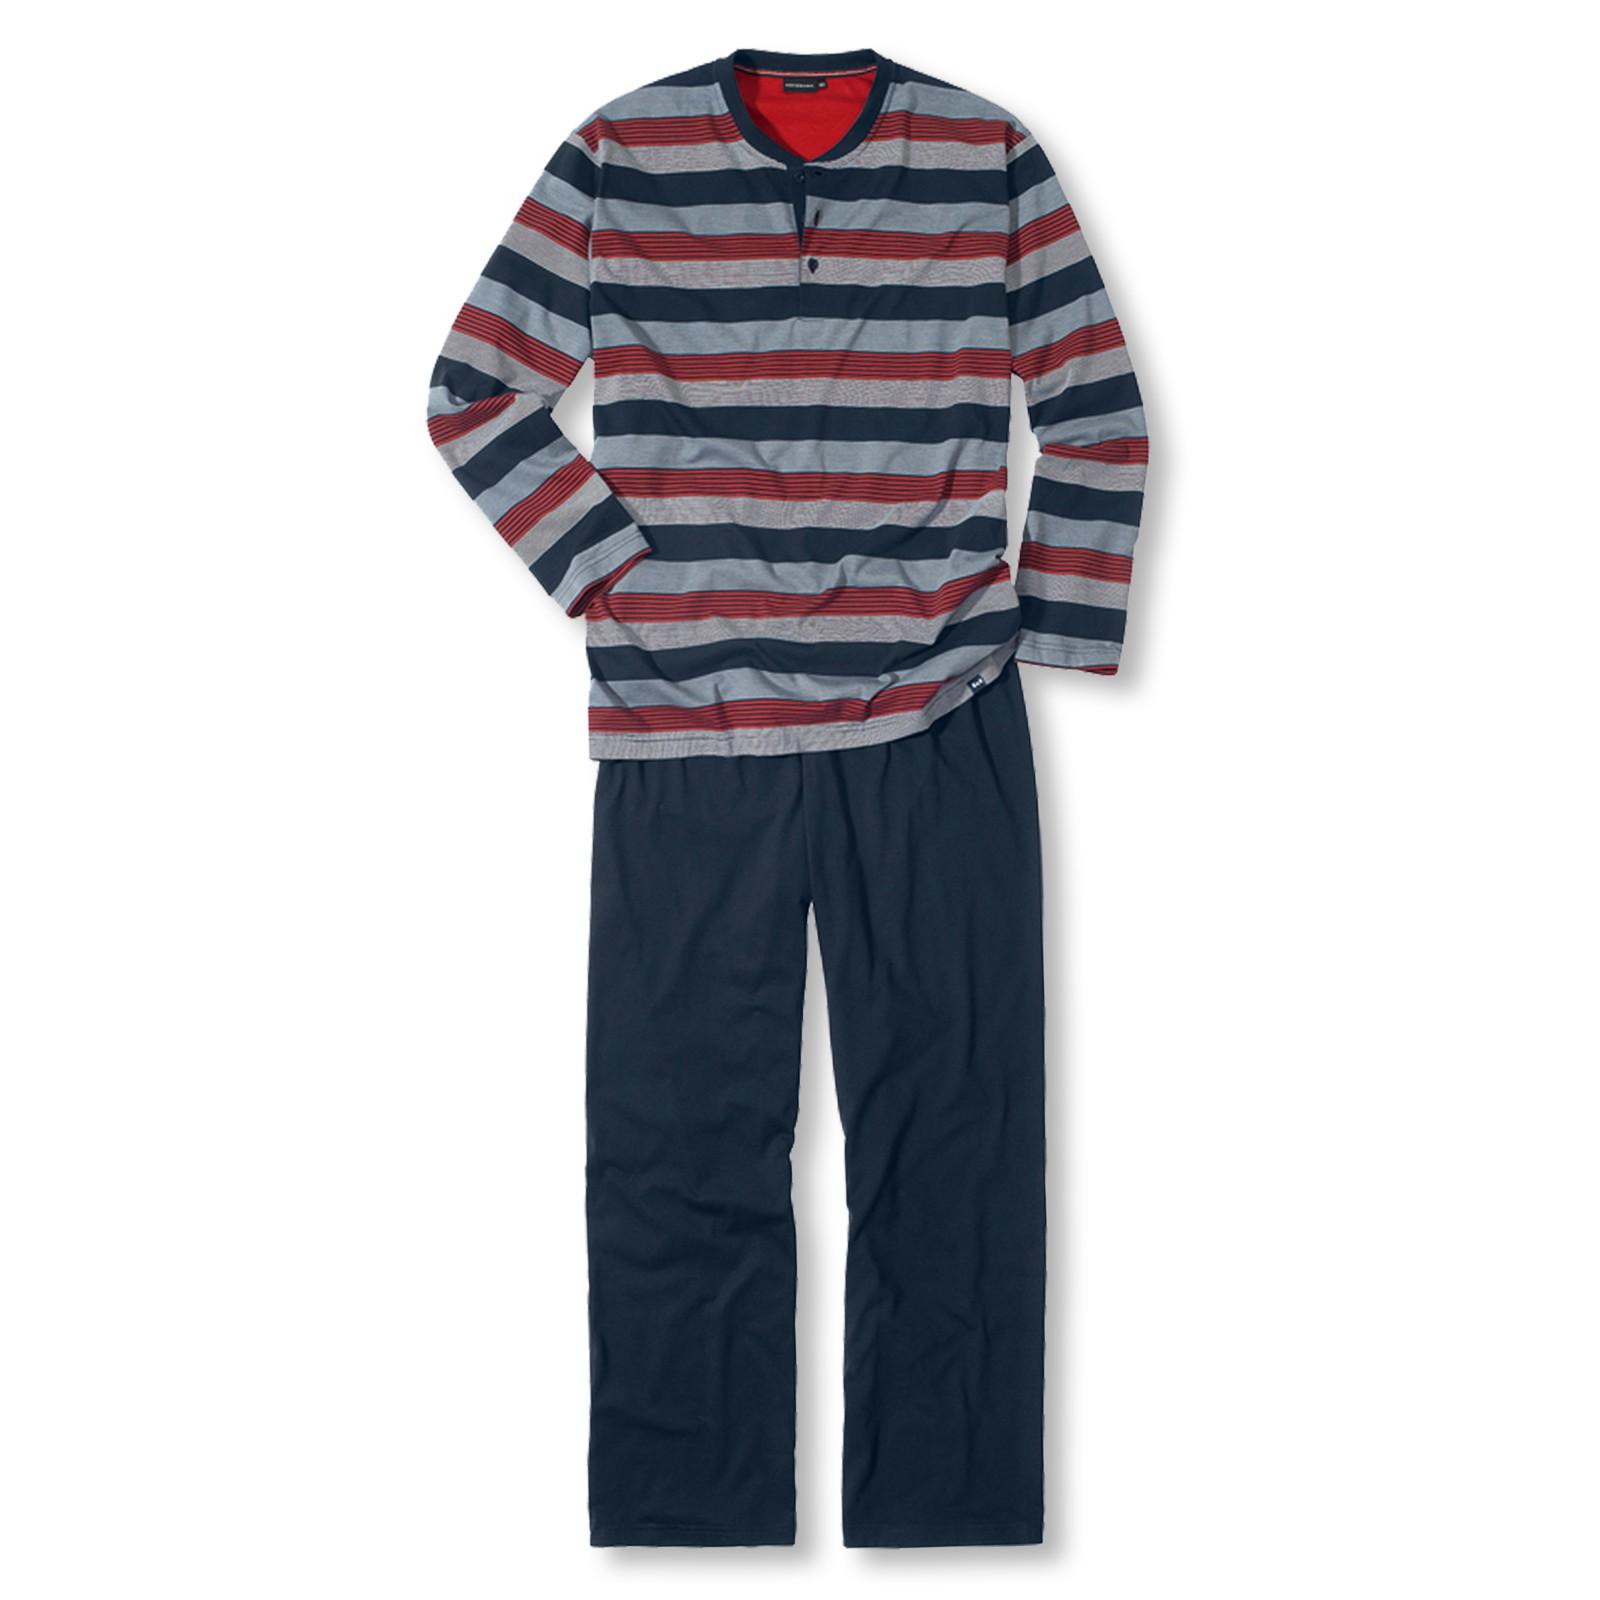 Götzburg Herren Pyjama Craig 451355 S M L XL XXL in chili pepper